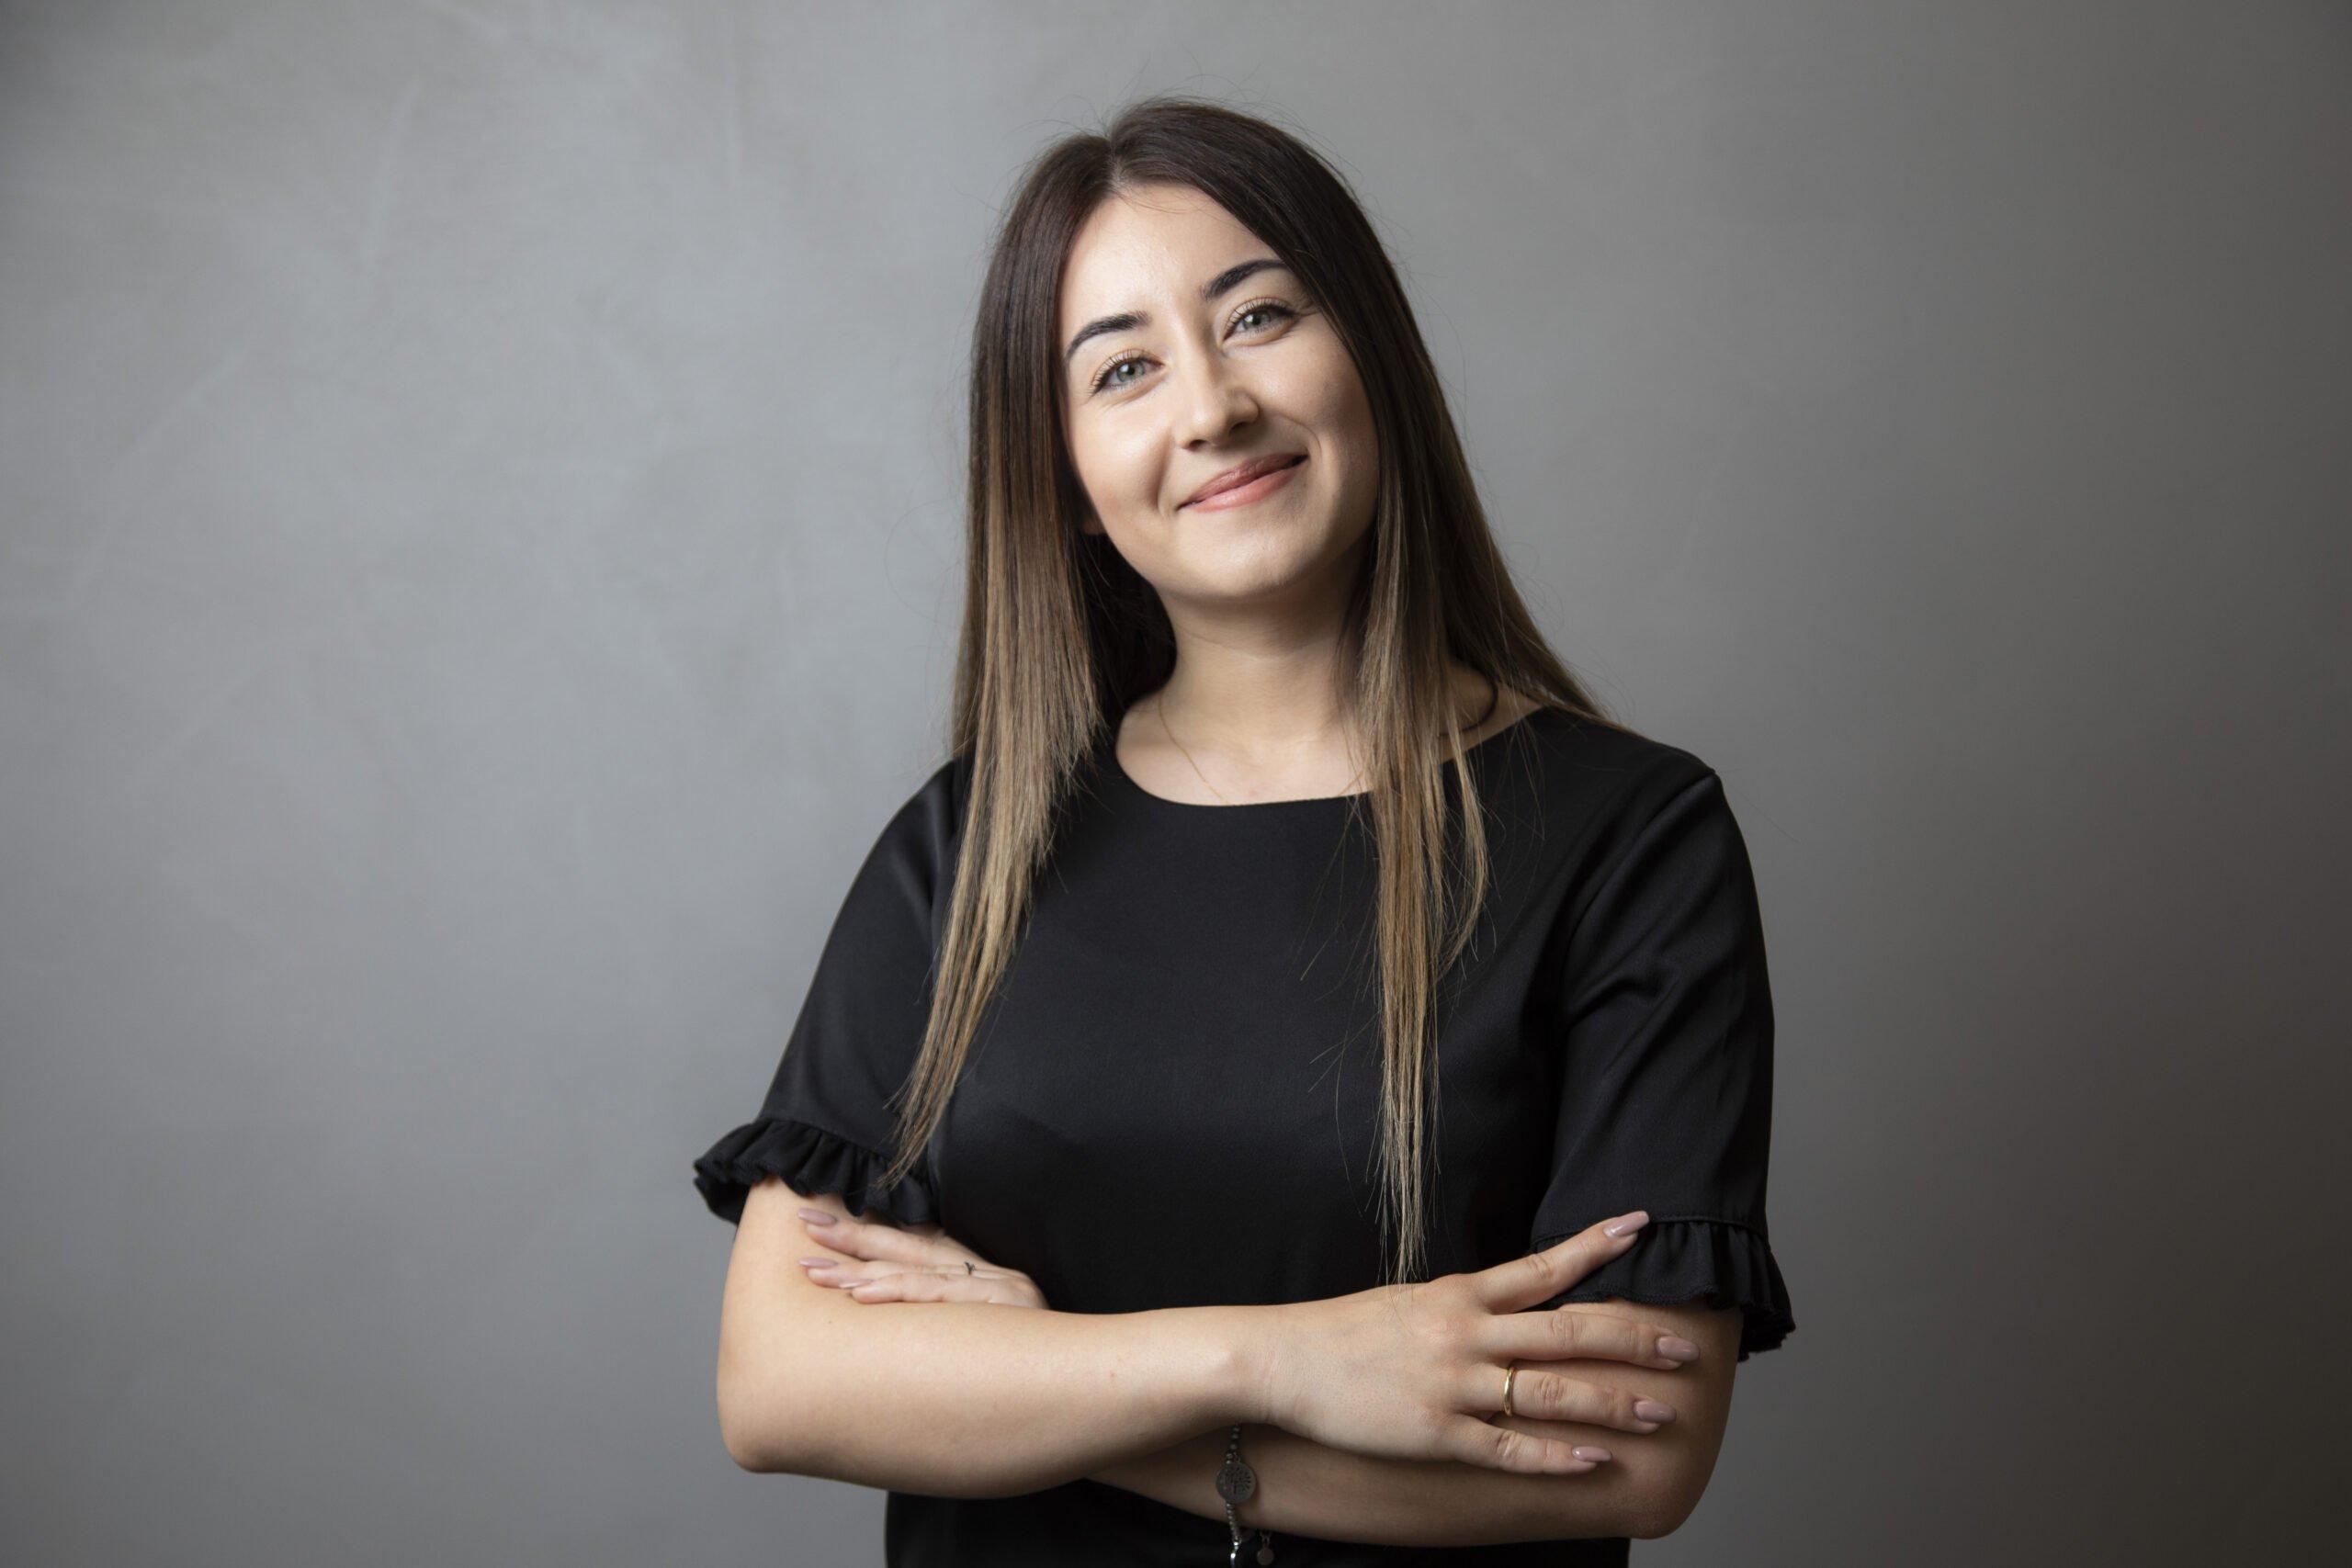 Rag. Natalia Munteanu